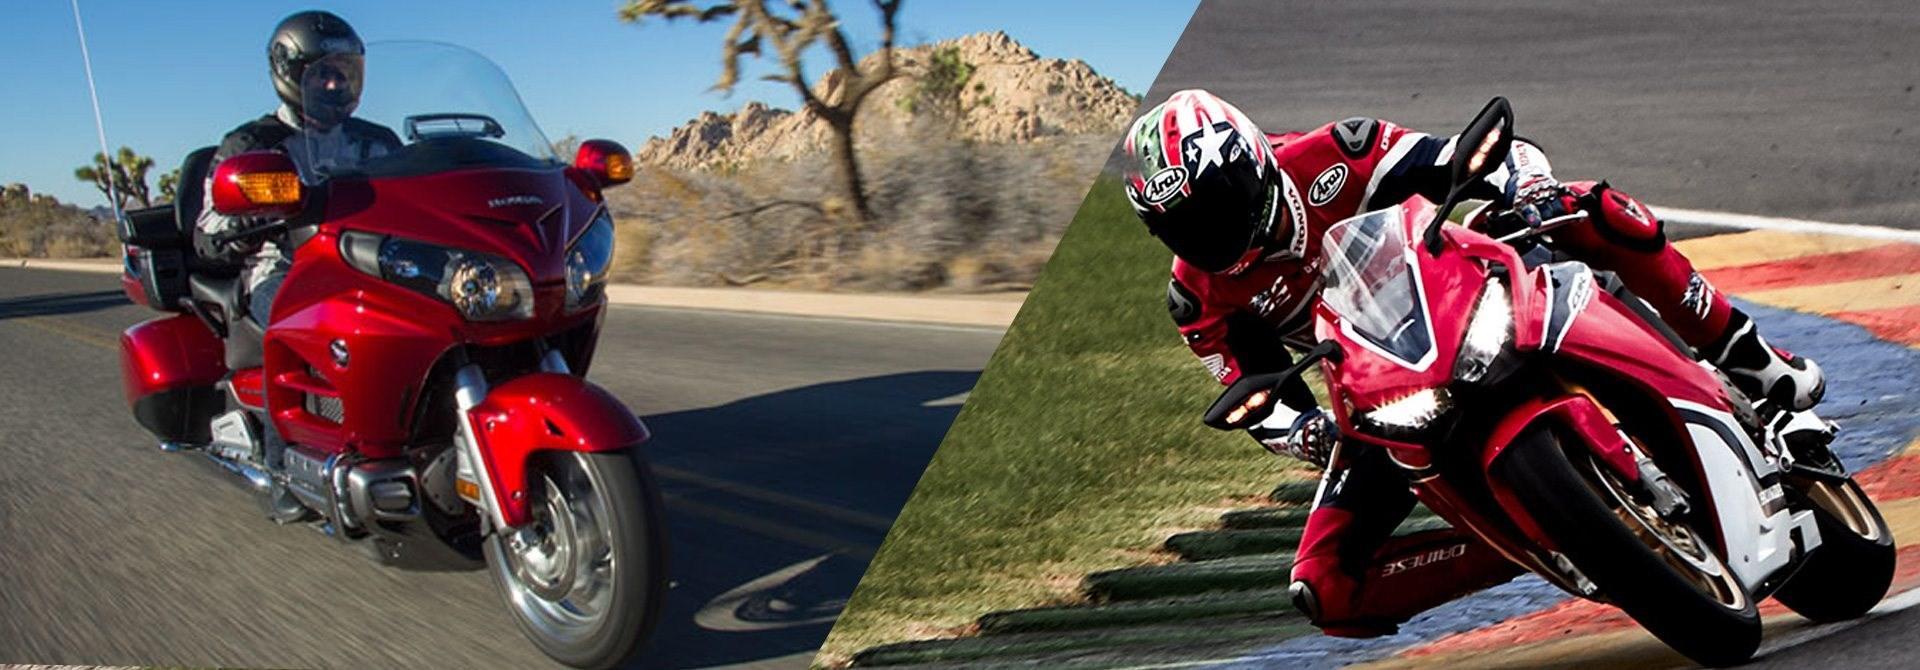 Motorcycle dealer new york honda yamaha scooter parts for New york yamaha honda